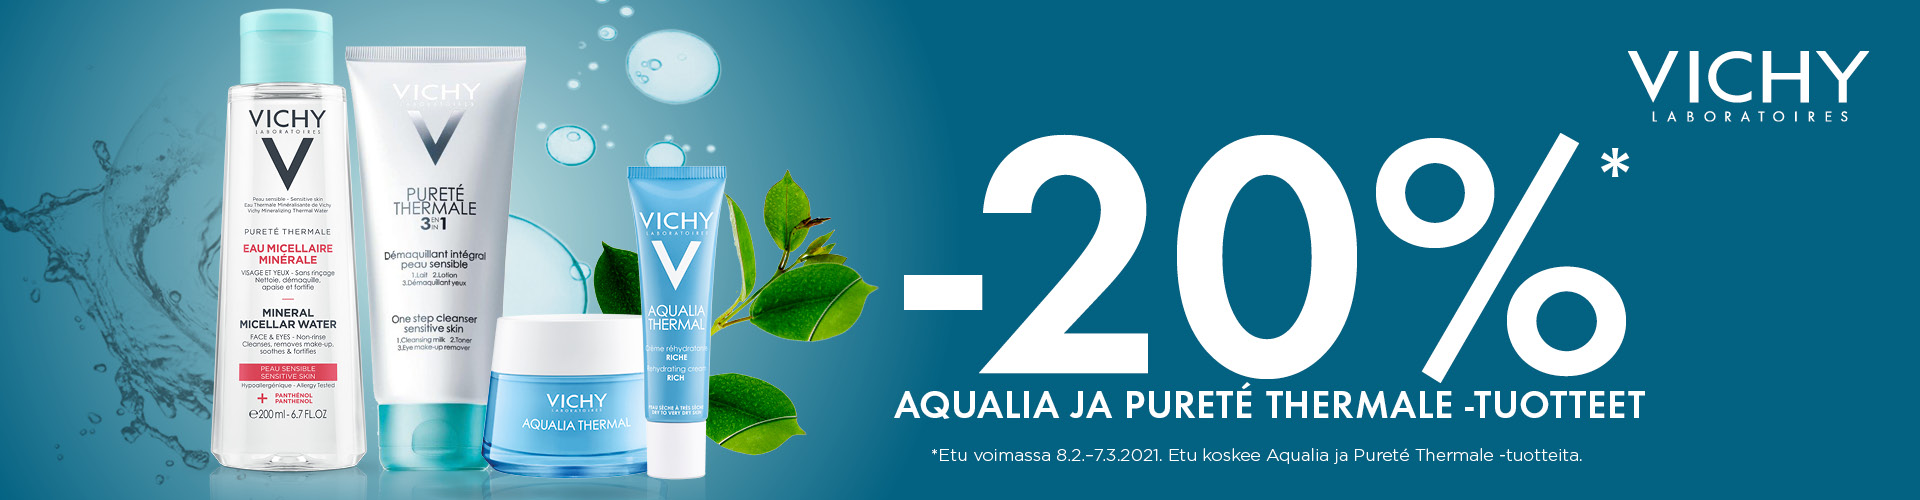 Vichy Aqualia Thermal & Pureté Thermale -20 %